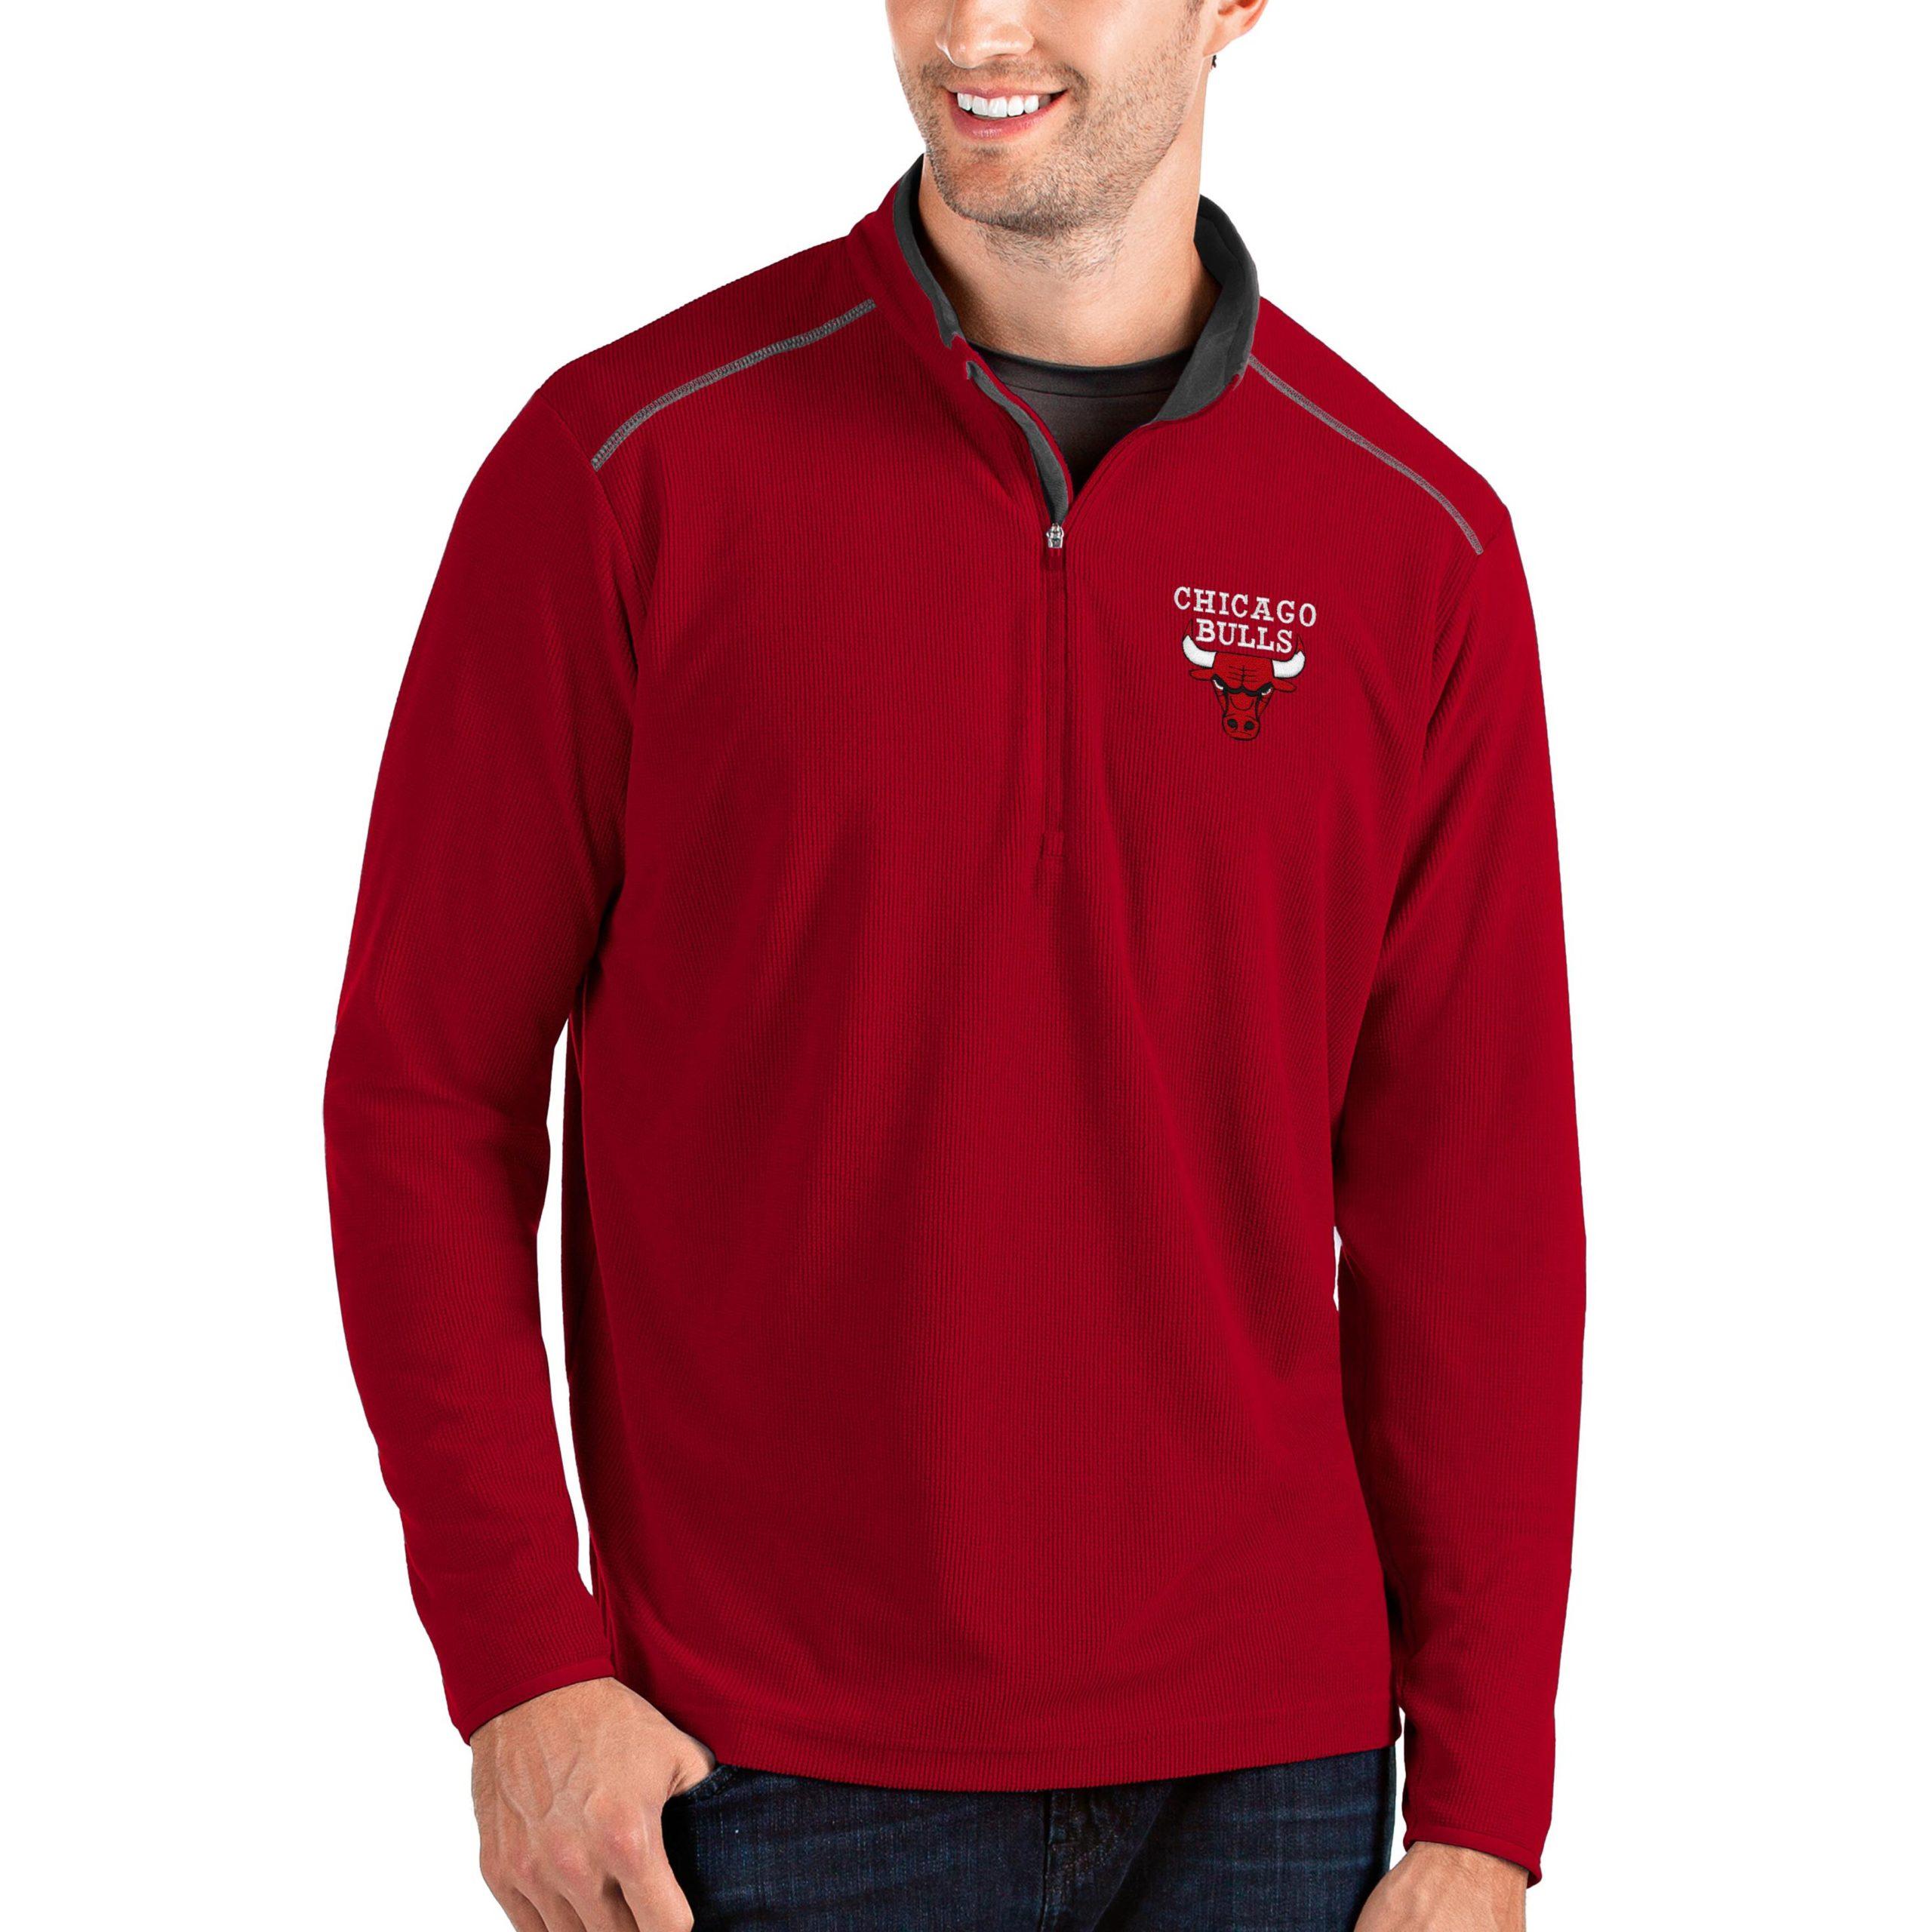 Chicago Bulls Antigua Big & Tall Glacier Quarter-Zip Pullover Jacket - Red/Gray